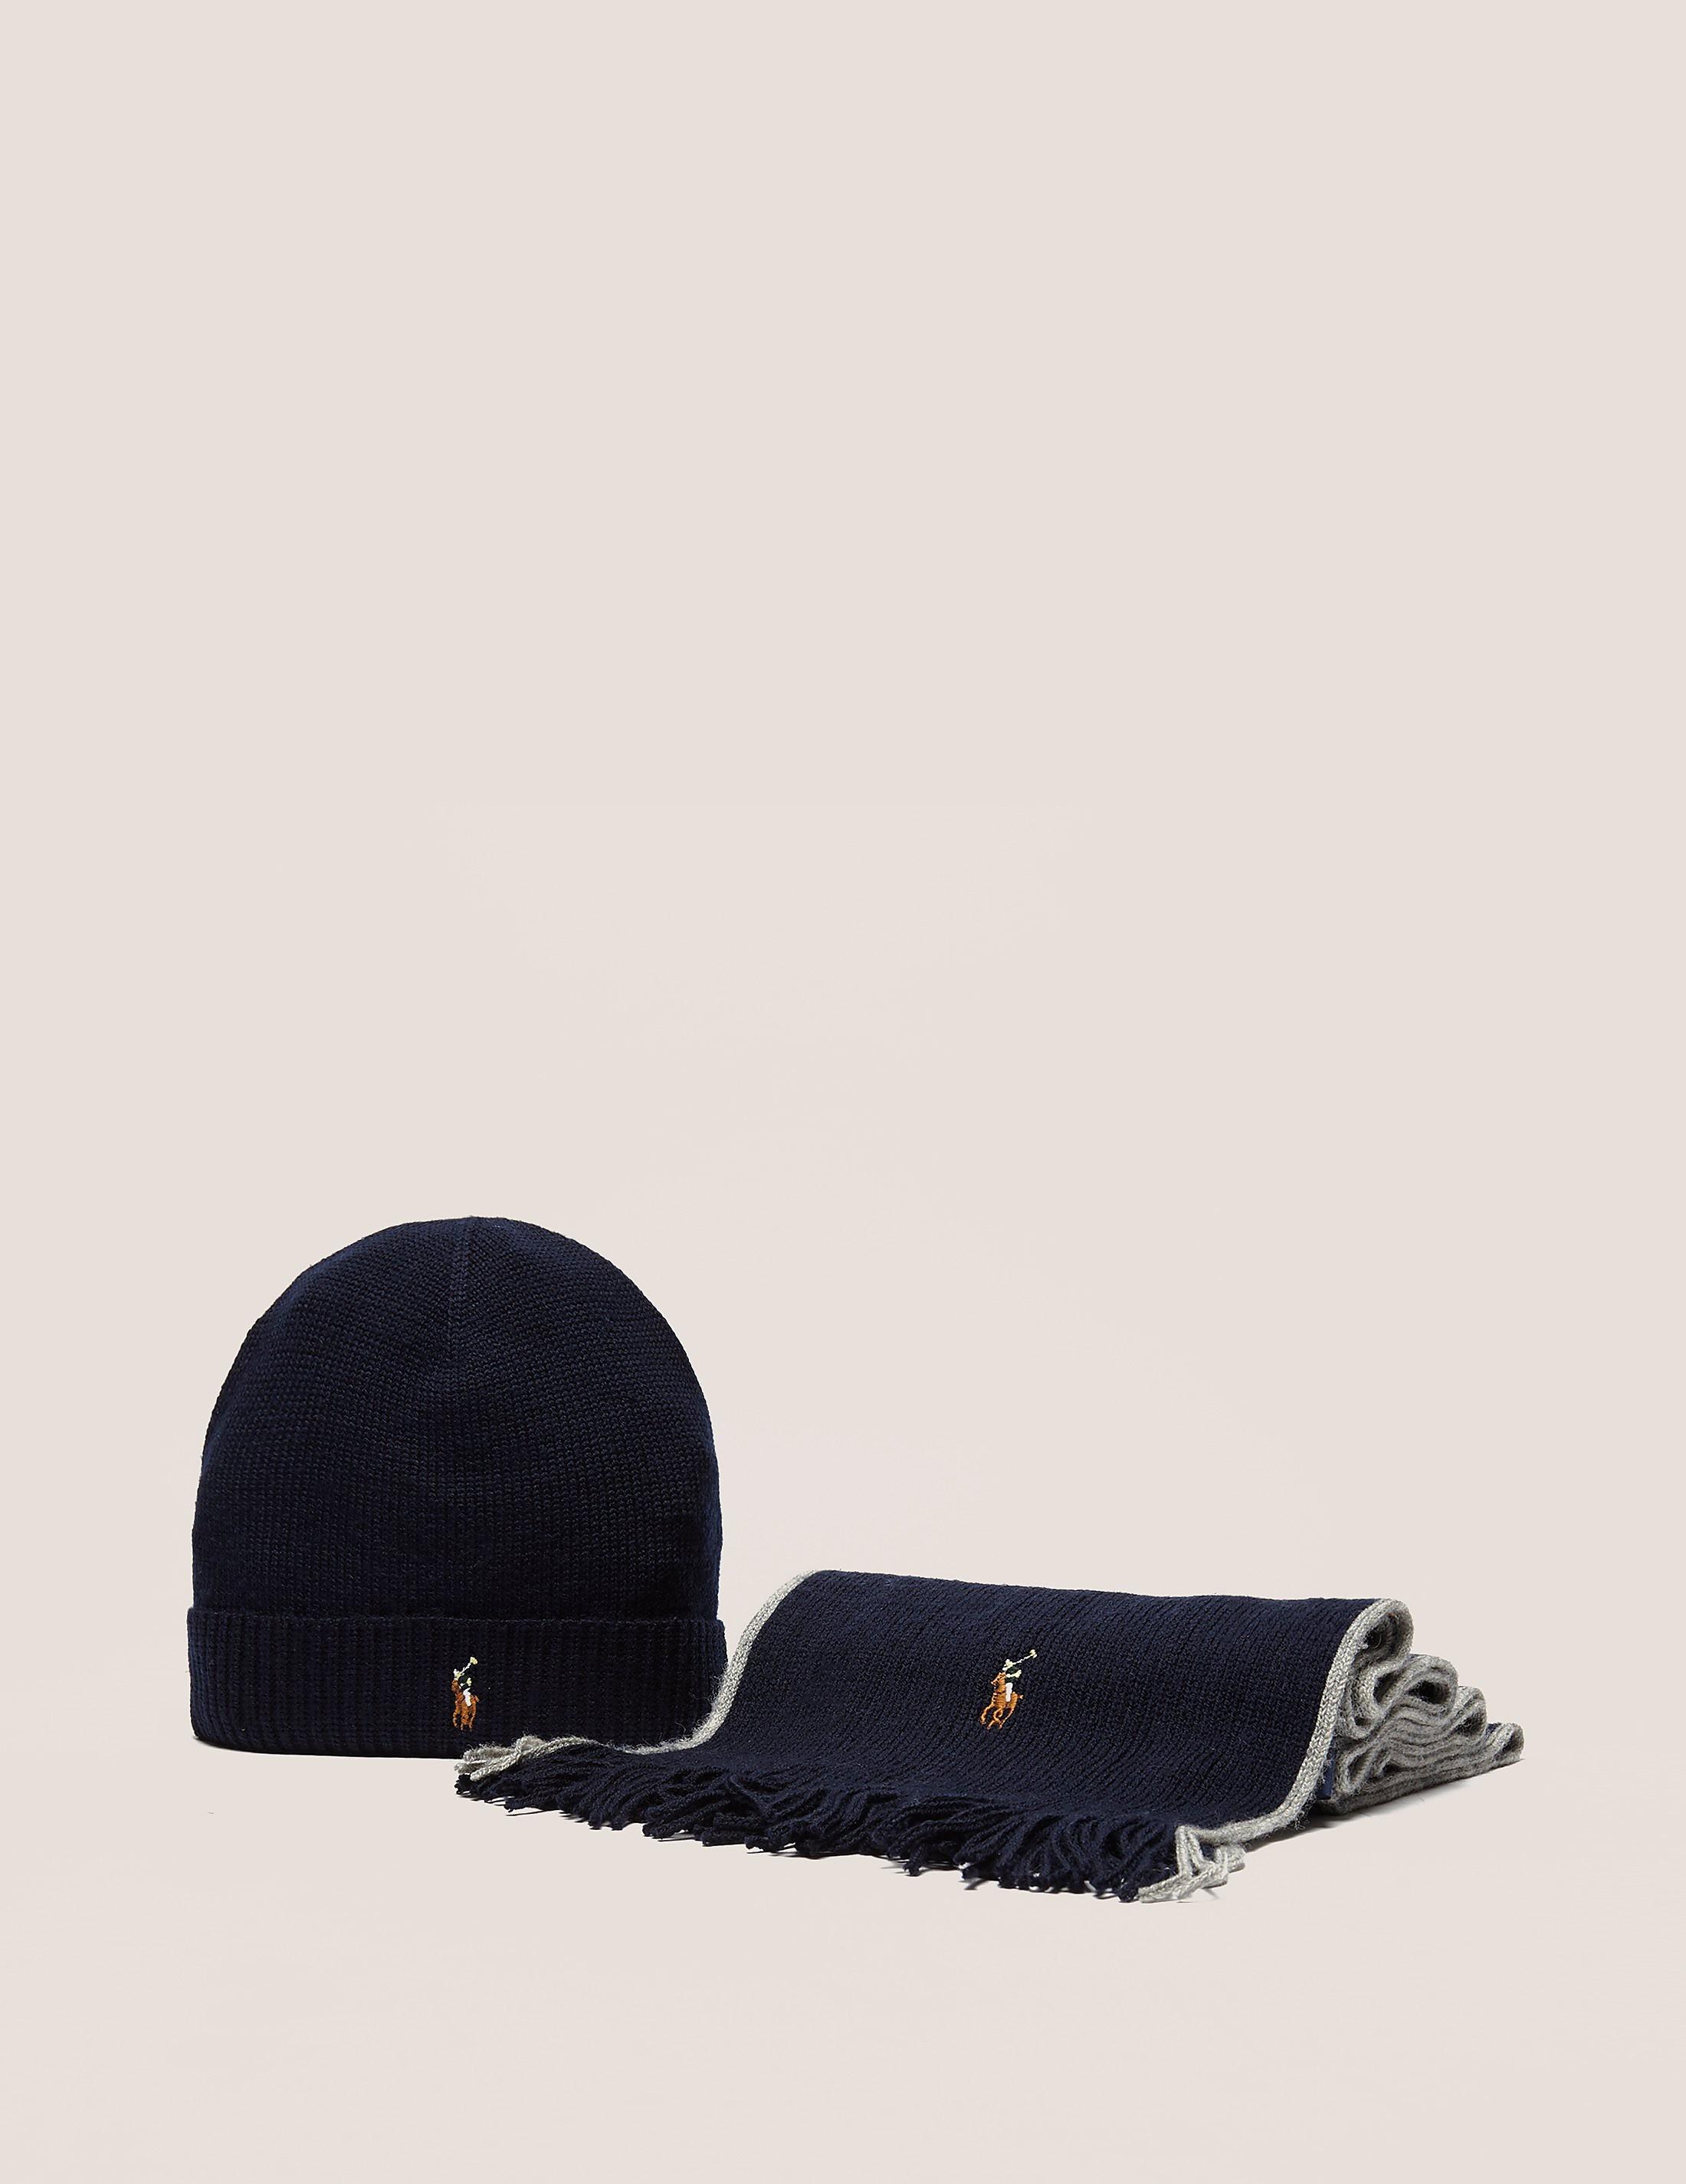 Polo Ralph Lauren Merino Scarf & Hat Gift Set